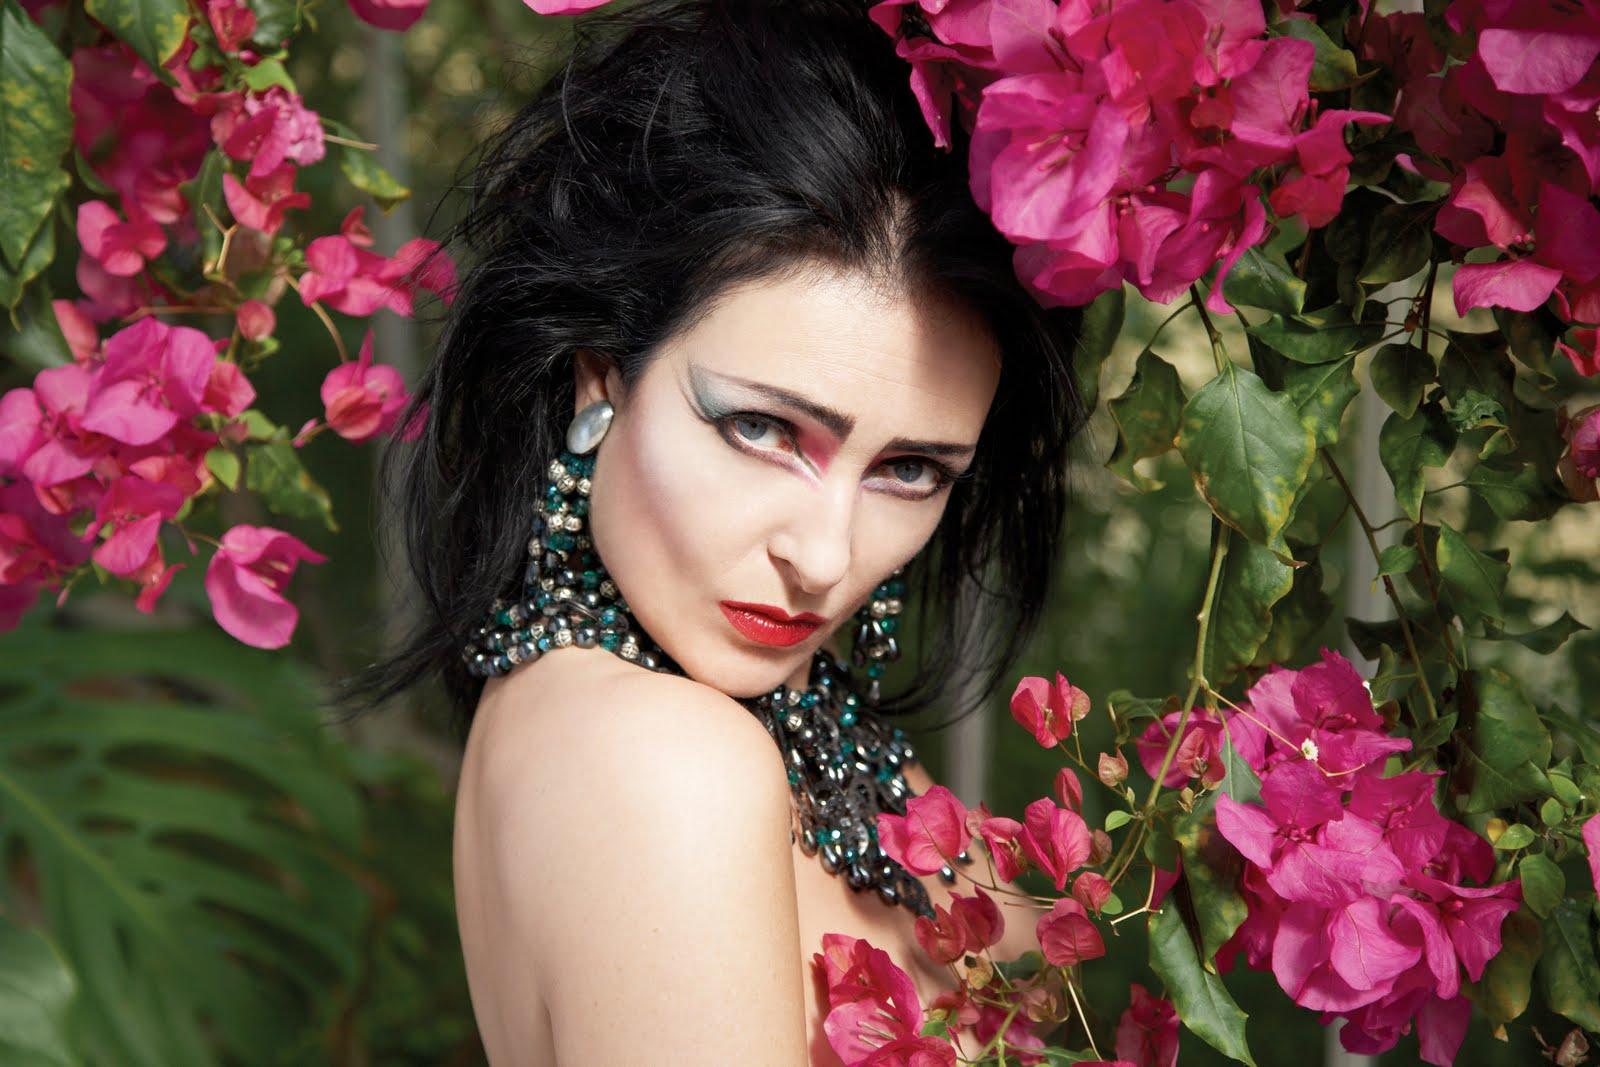 http://3.bp.blogspot.com/-FahhVm-NSA8/Td-v9prWLcI/AAAAAAAADTk/B72ipFN01Tk/s1600/Siouxsie-Sioux.jpg